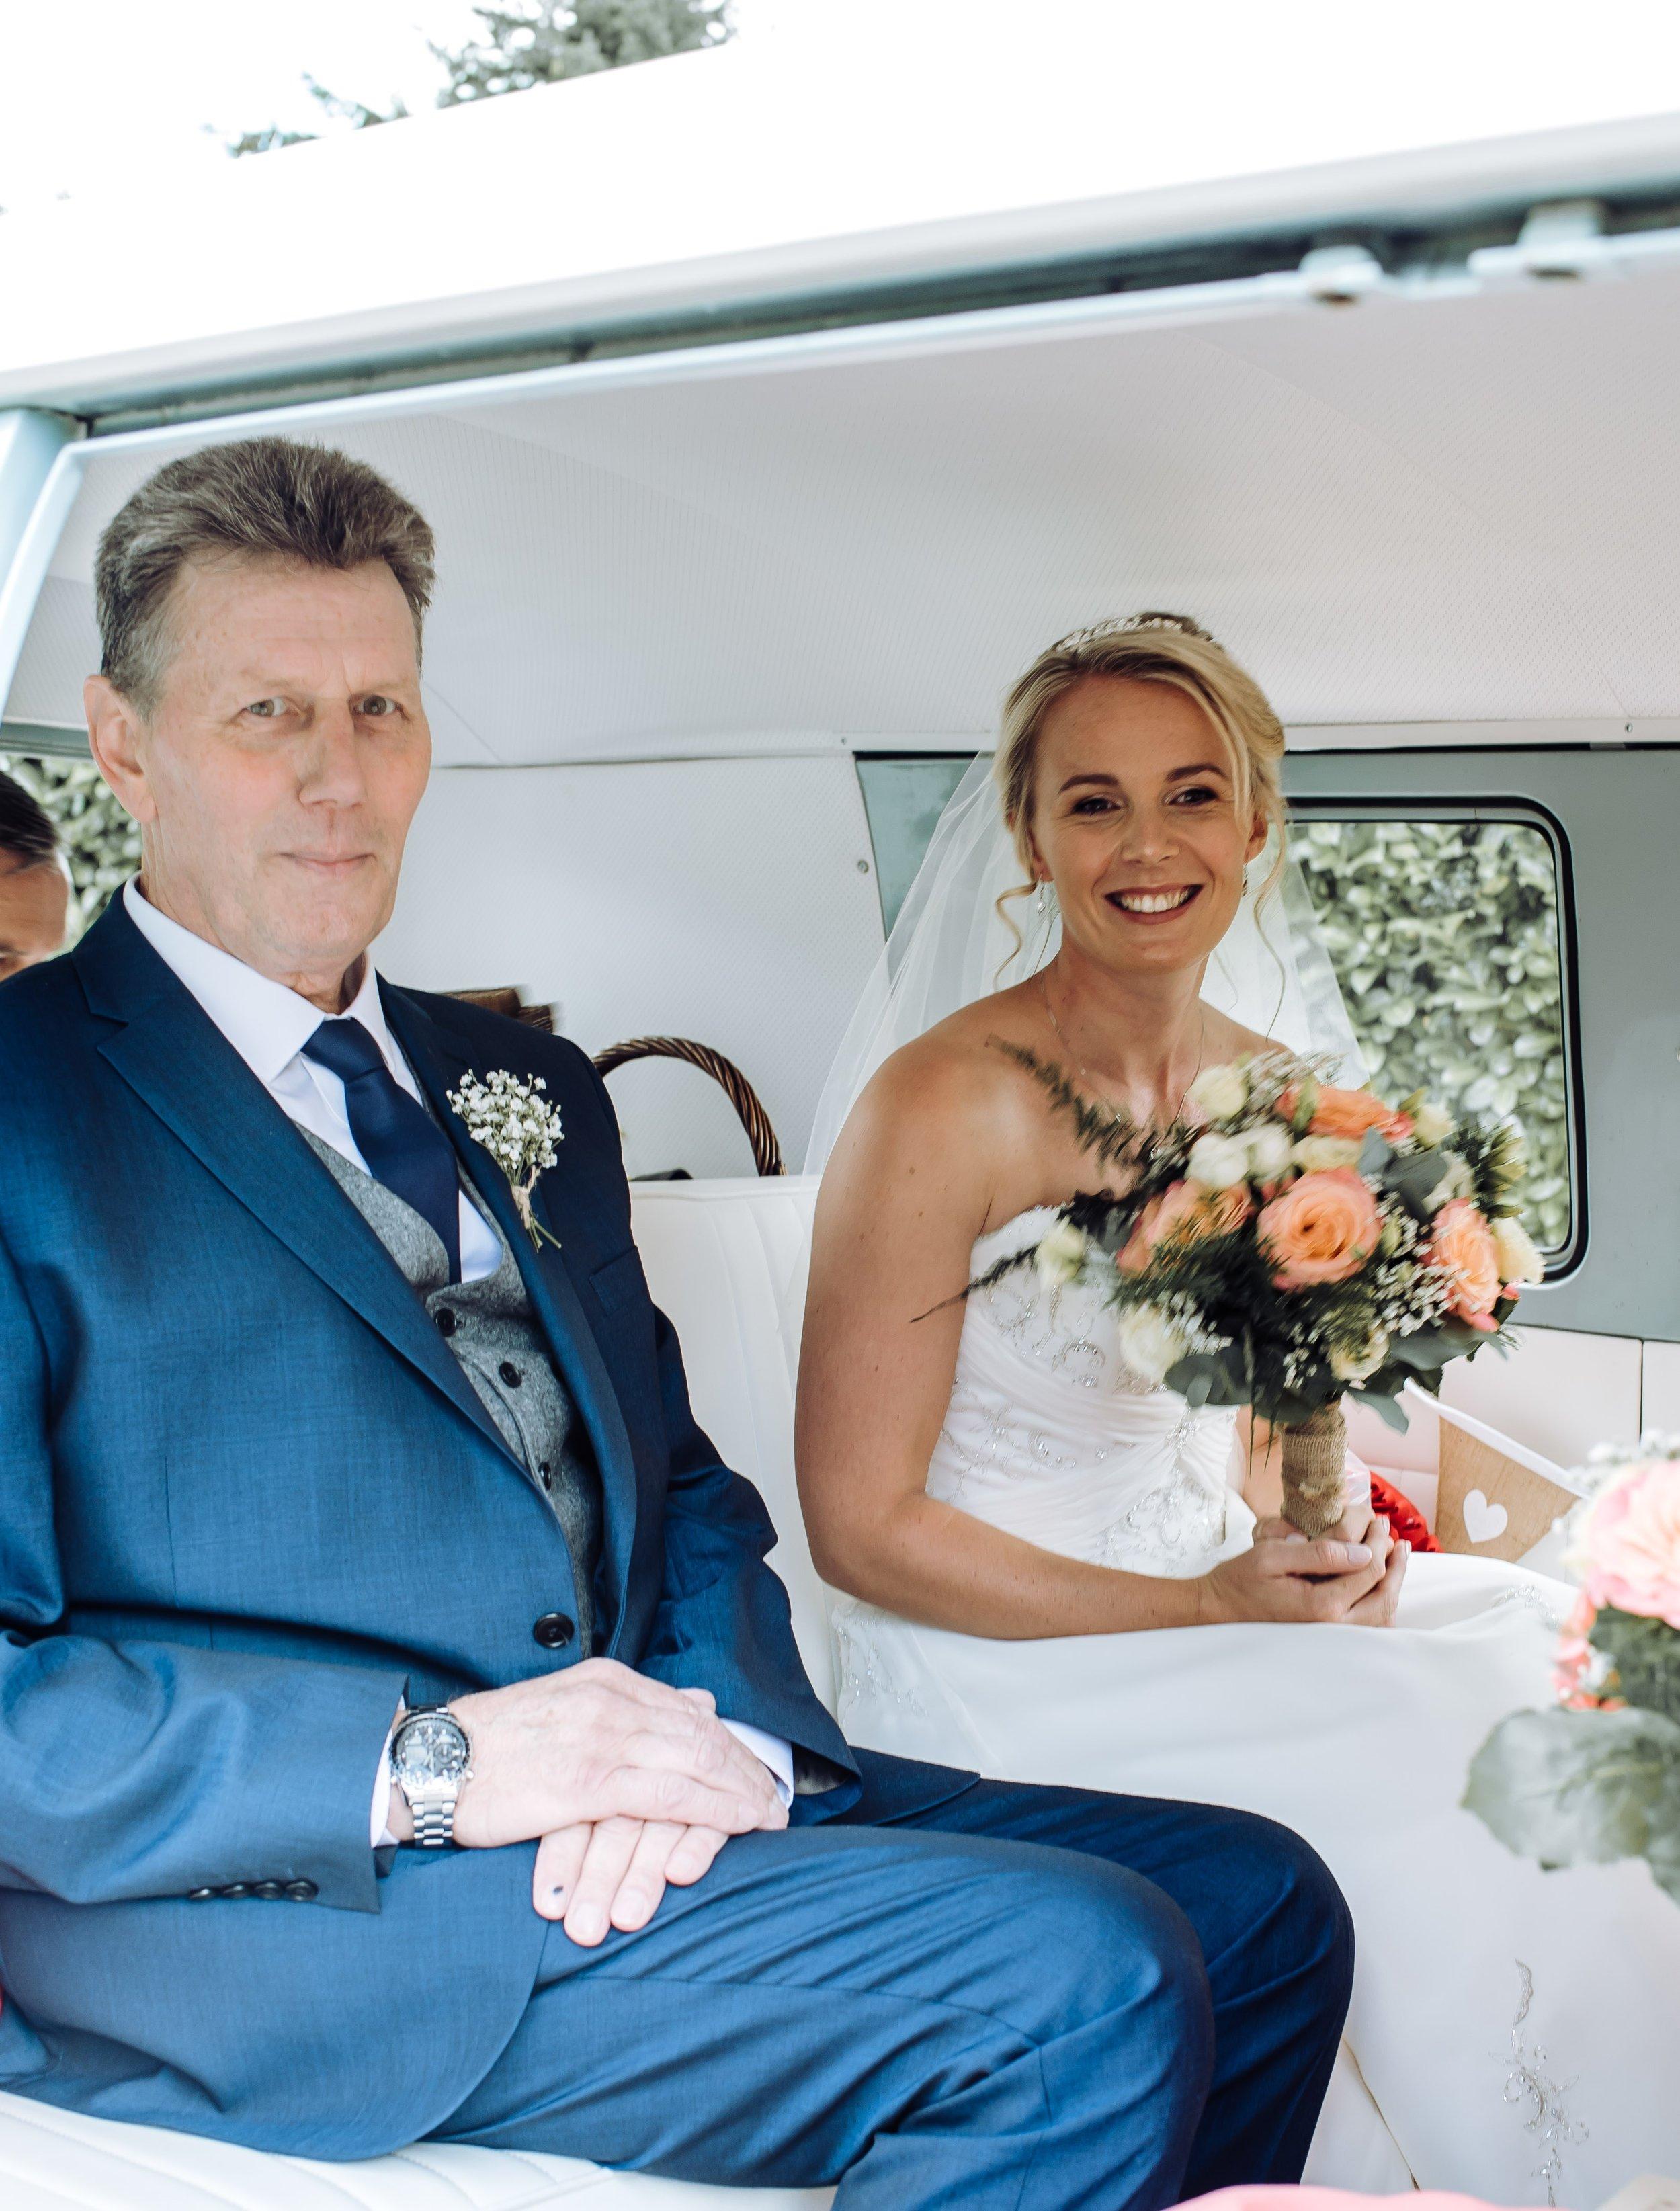 Vintage Wedding - East Sussex Wedding Photographer_0175.jpg